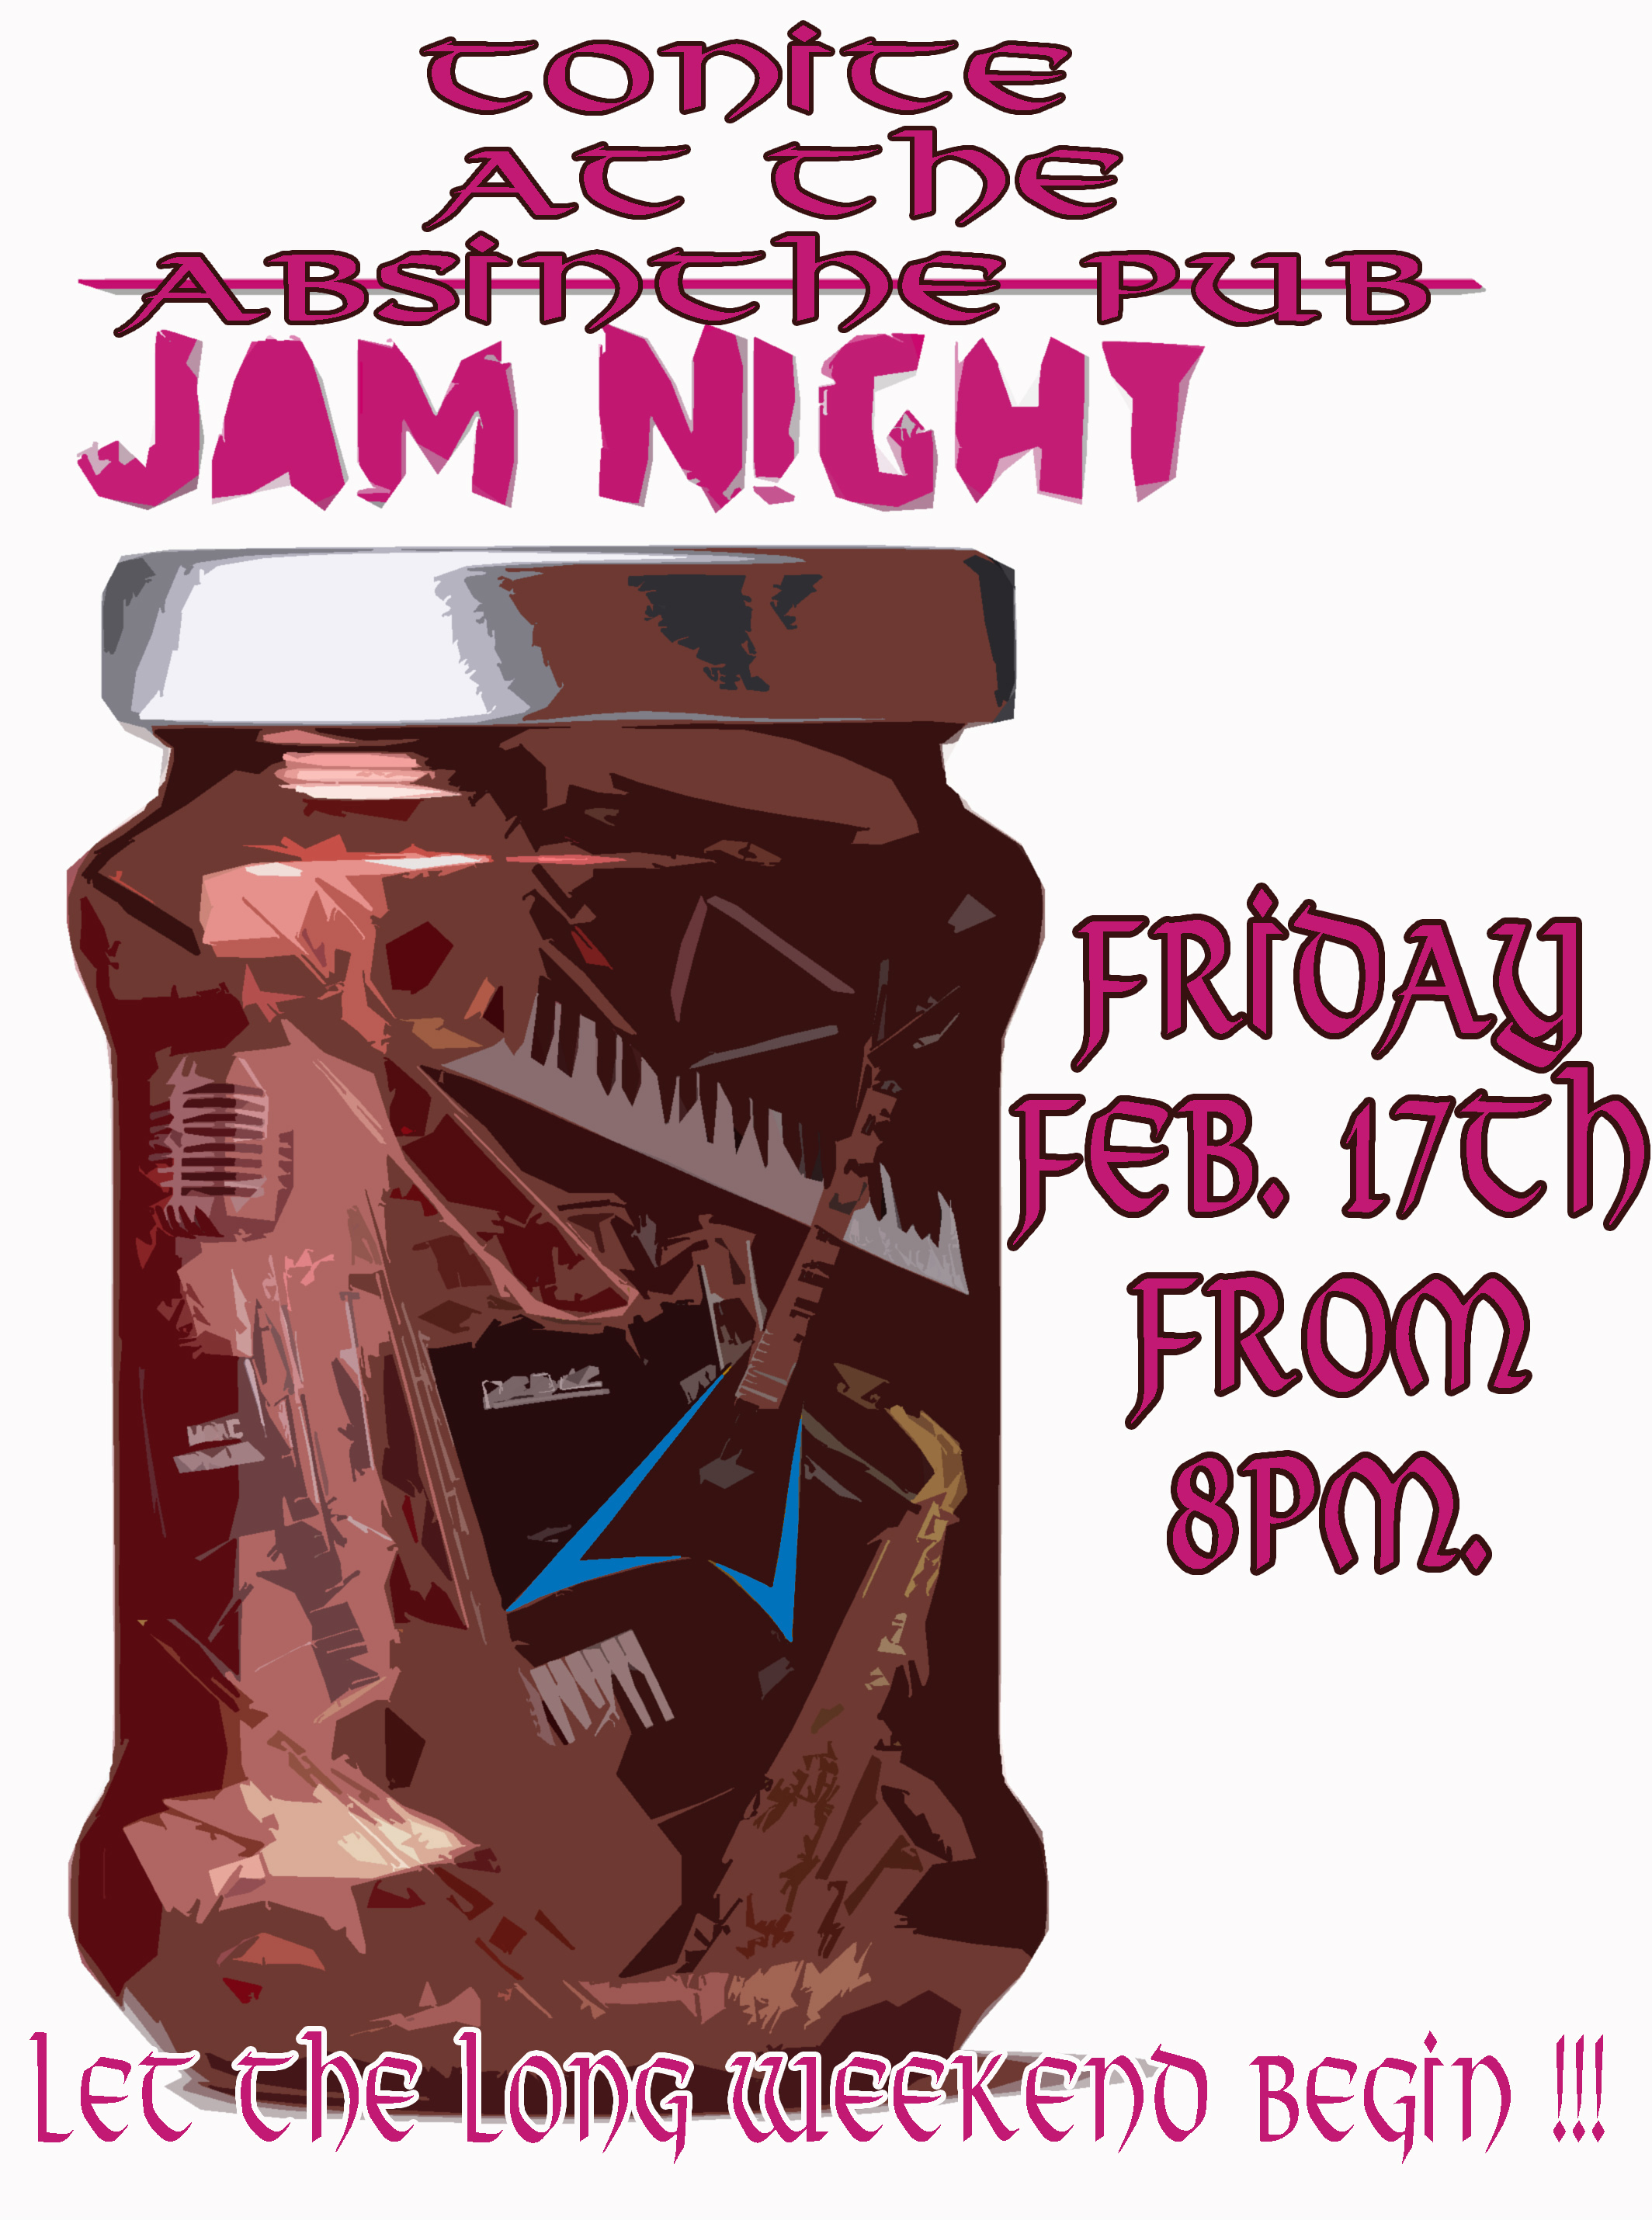 jam night poster.jpg